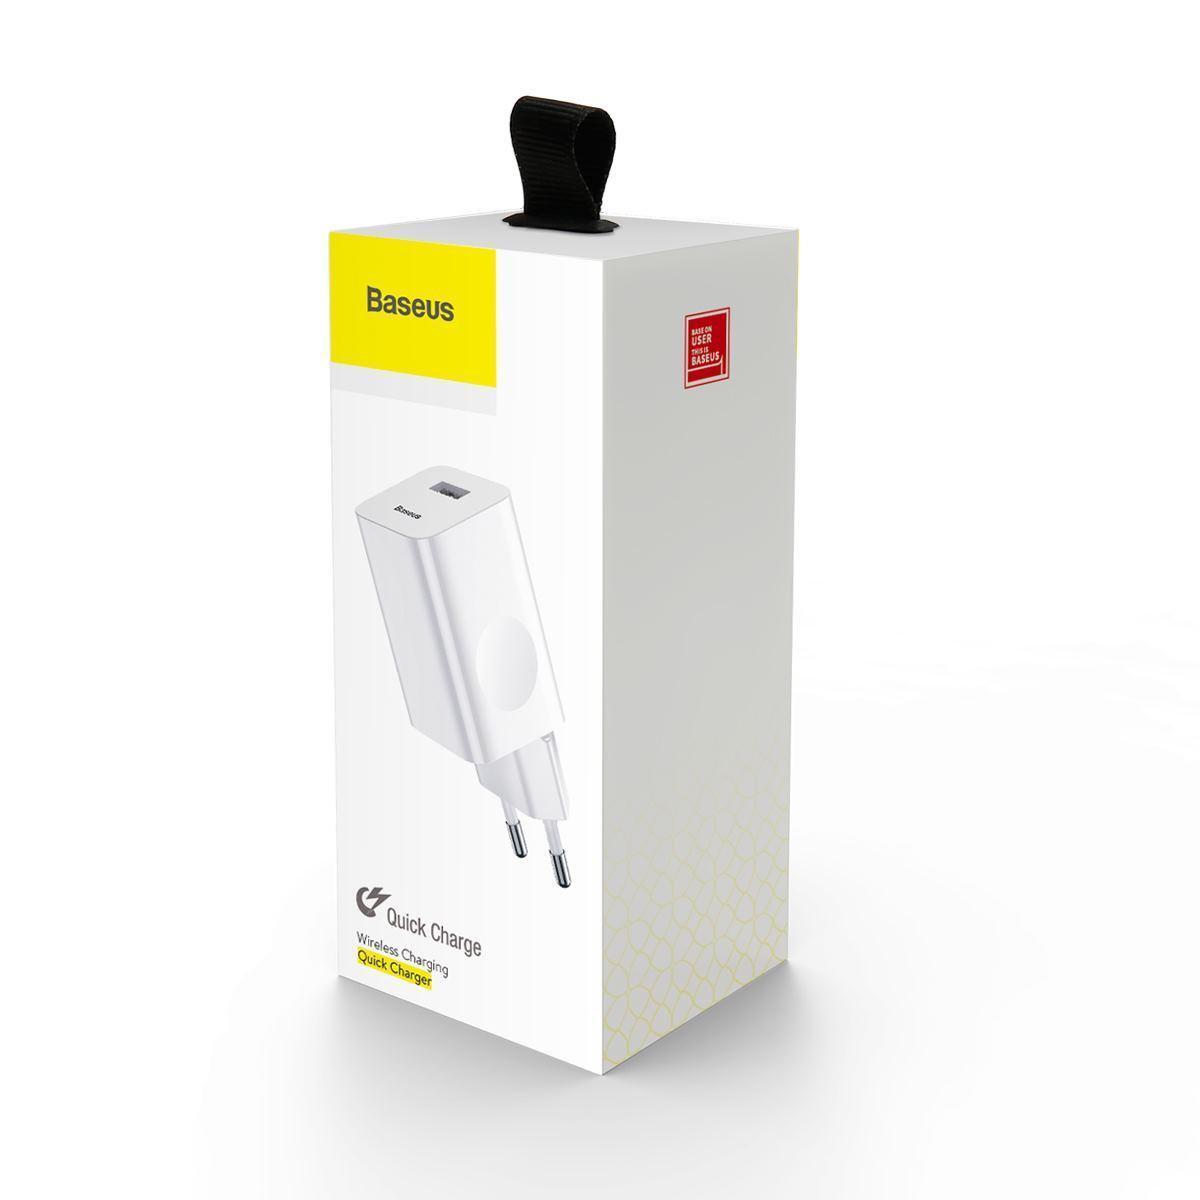 Зарядное устройство Baseus Charging Quick Charger 24W (white) (CCALL-BX02)